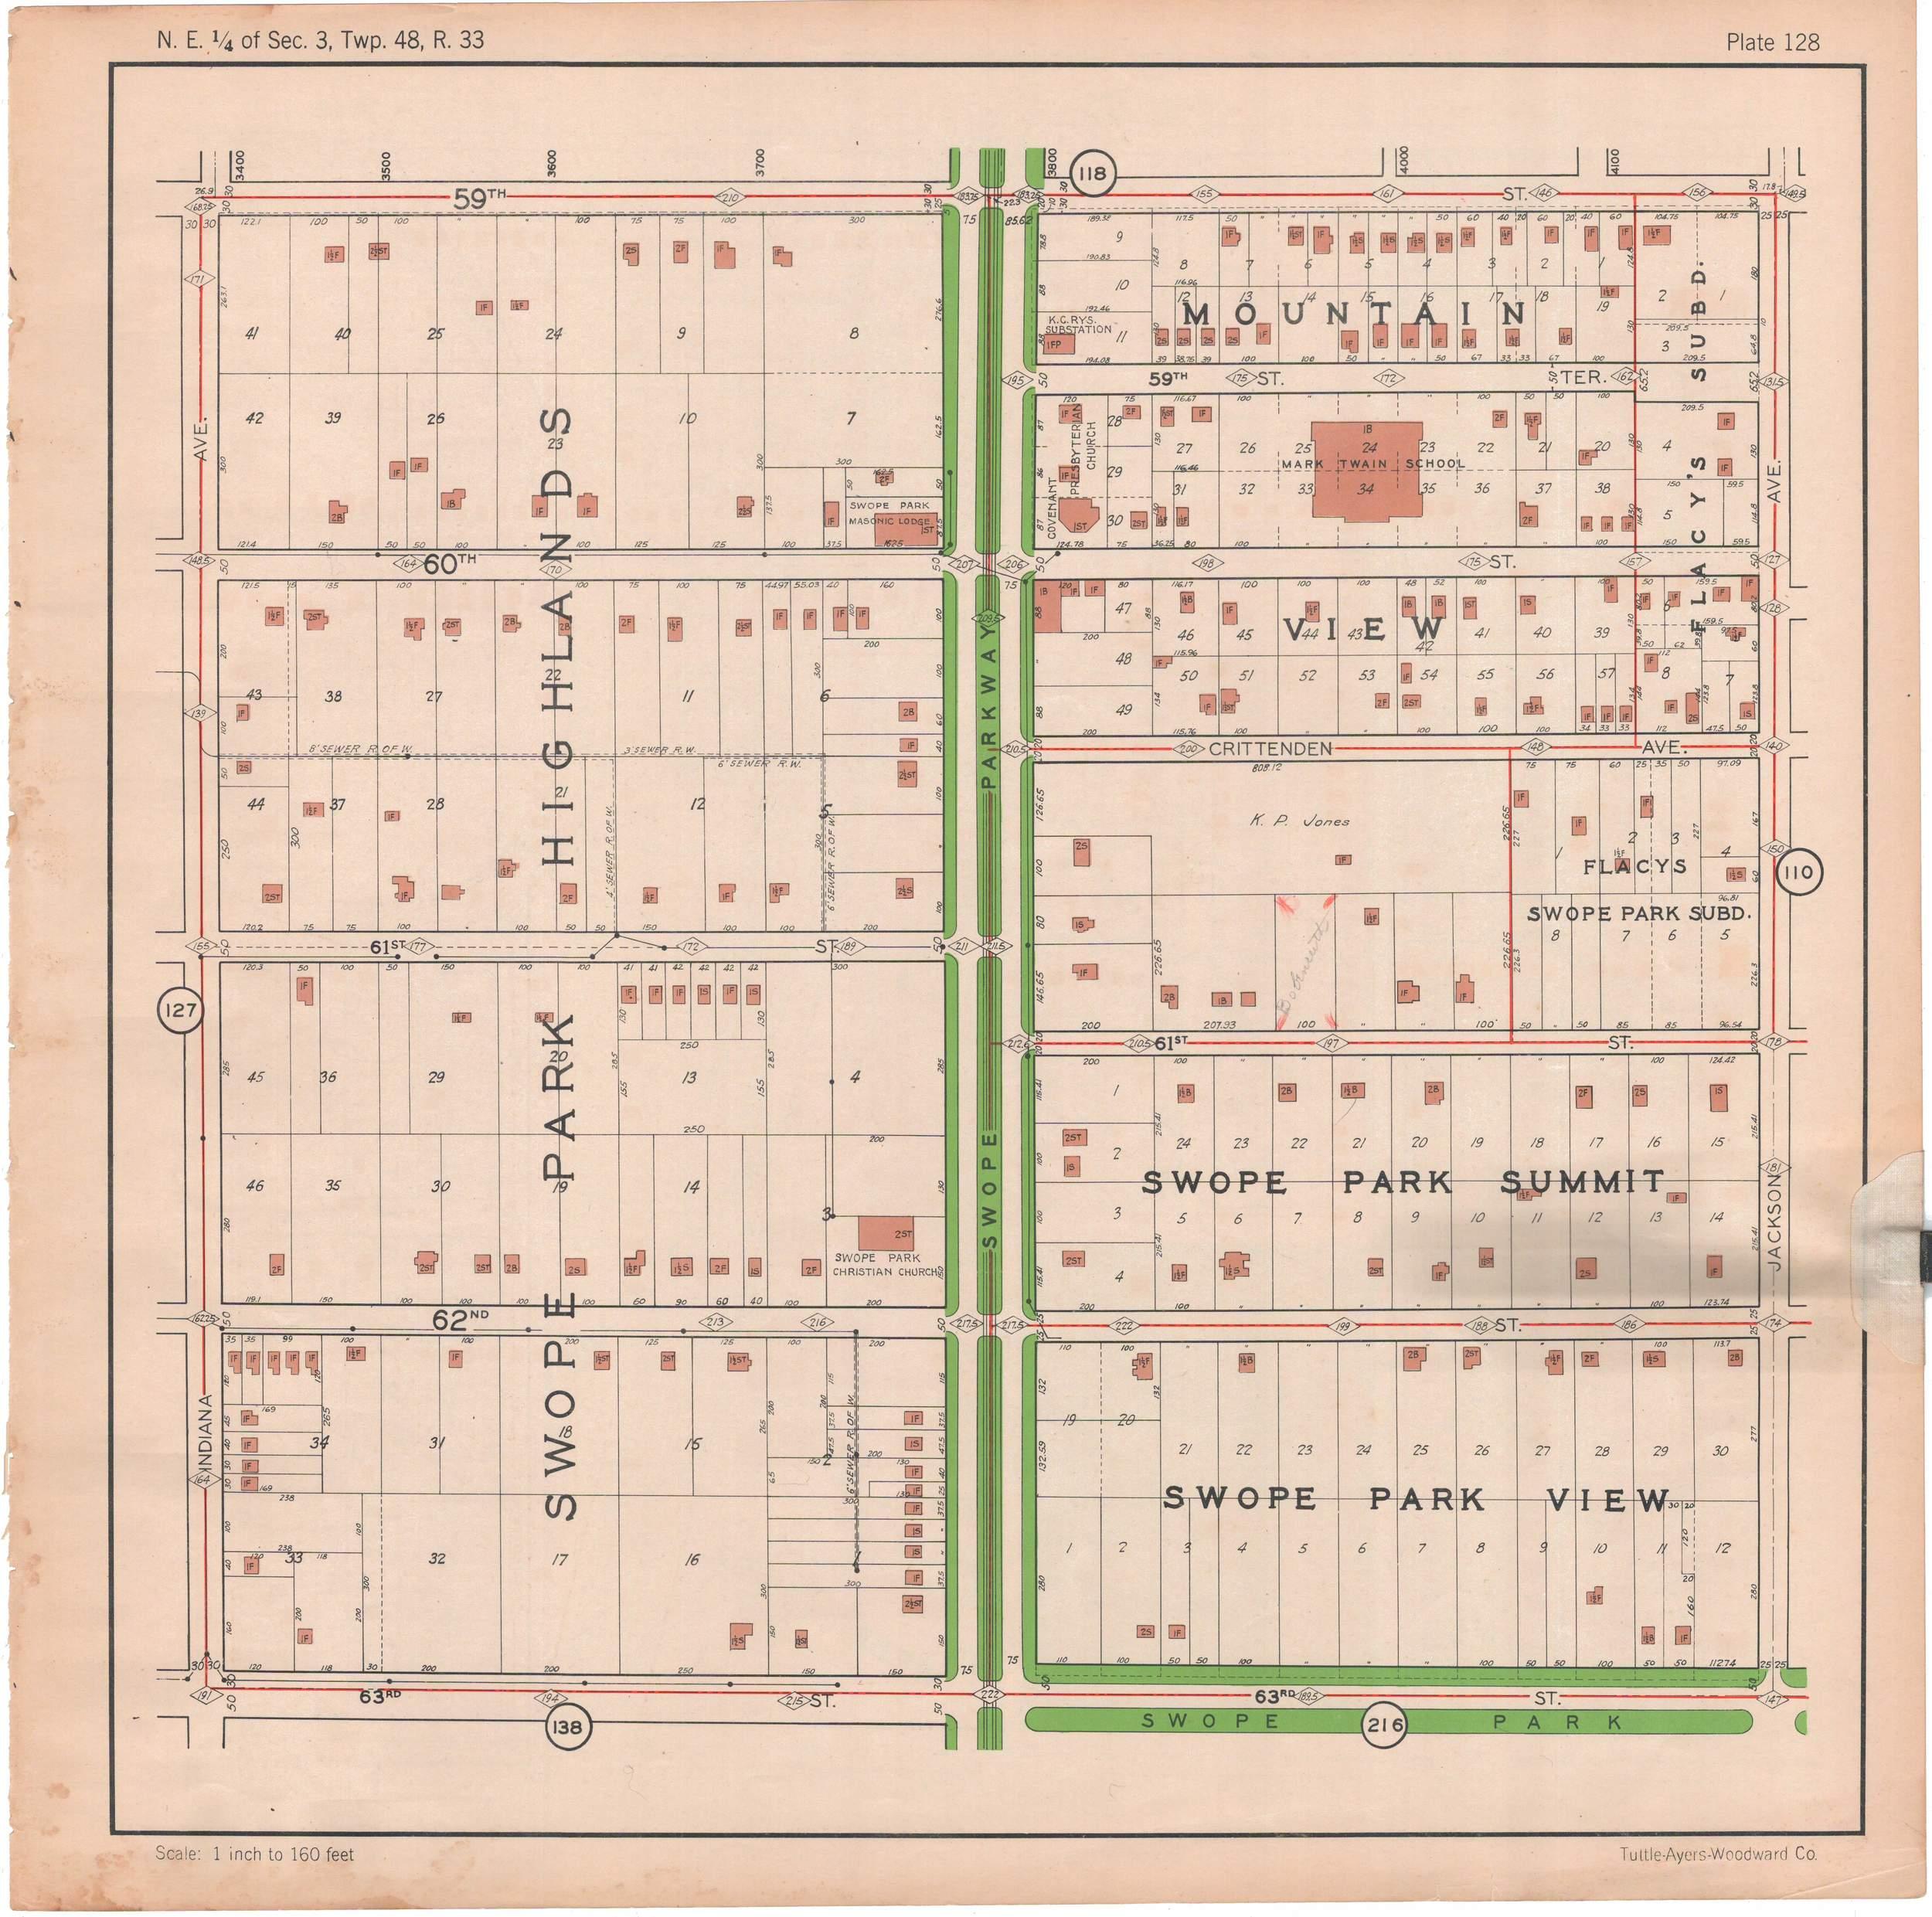 1925 TUTTLE_AYERS_Plate 128.JPG